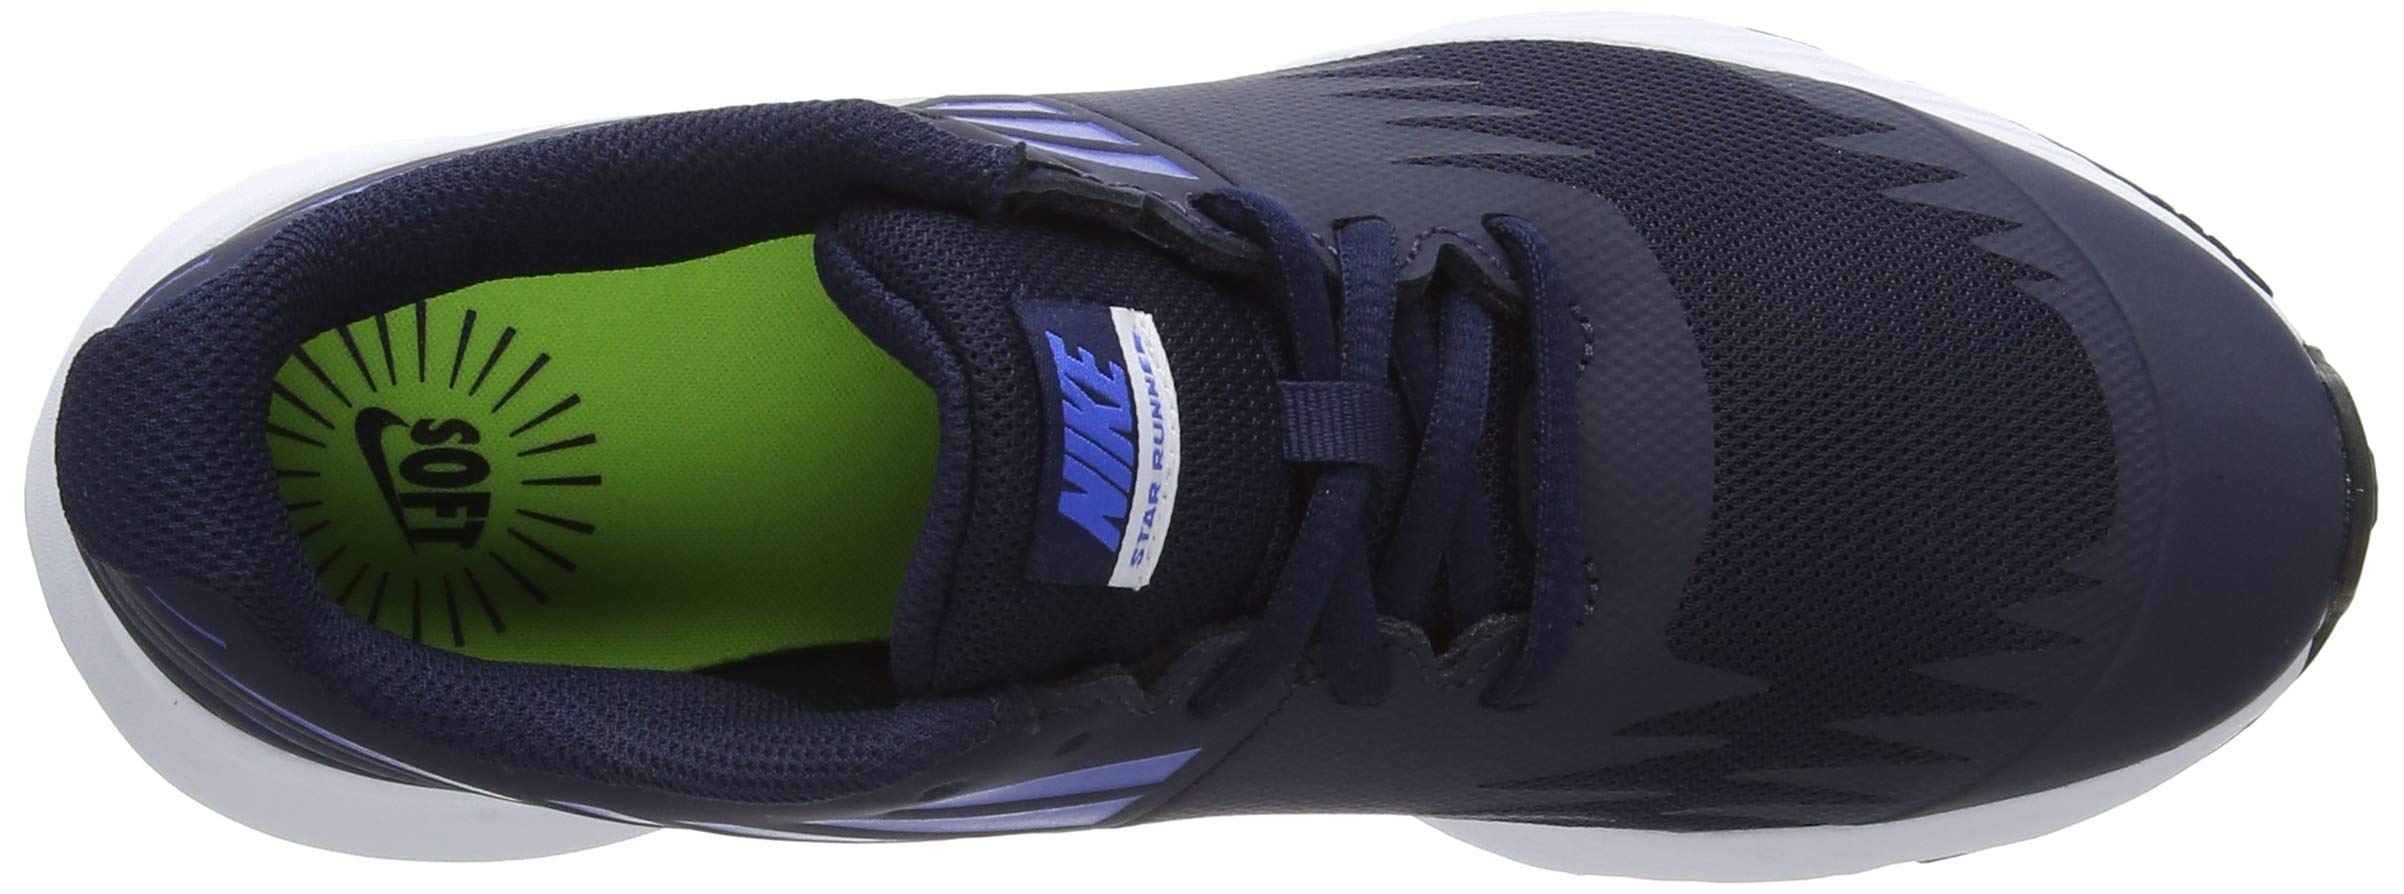 Nike Boy's Star Runner (GS) Running Shoe Obsidian/Metallic Silver/Signal Blue Size 3.5 M US by Nike (Image #7)